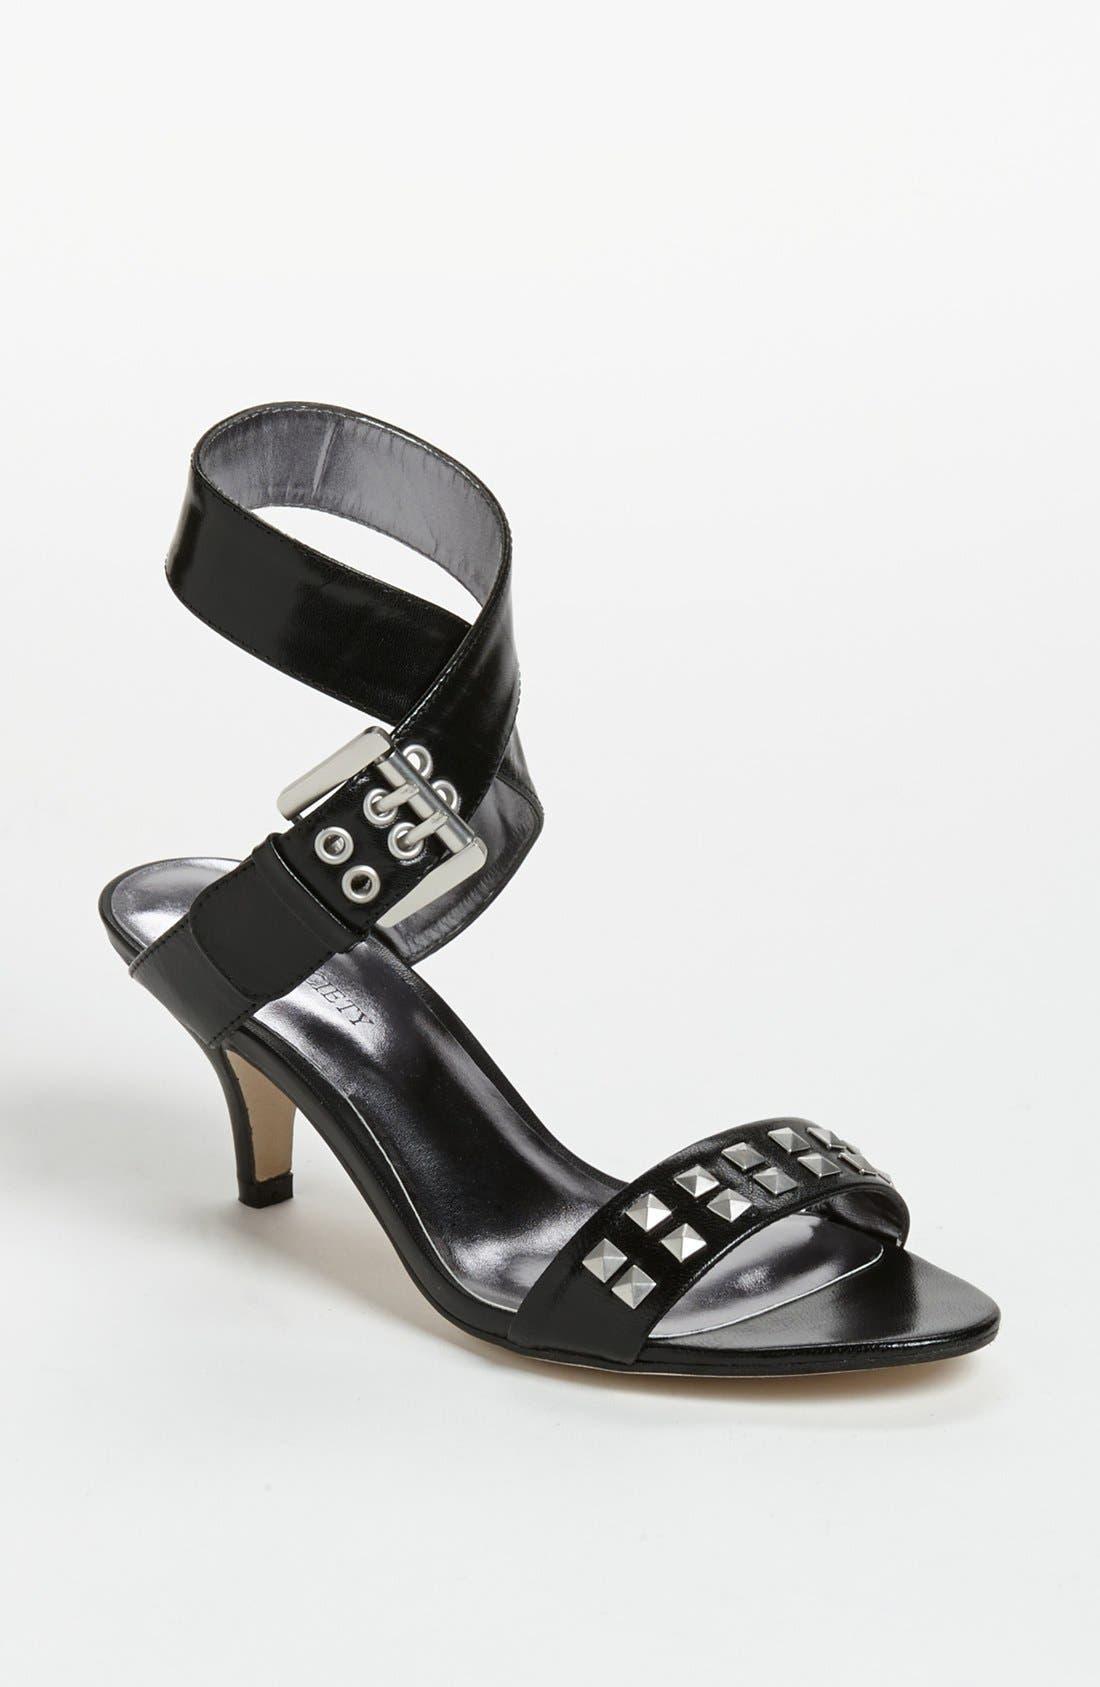 Alternate Image 1 Selected - Sole Society 'Jade' Sandal